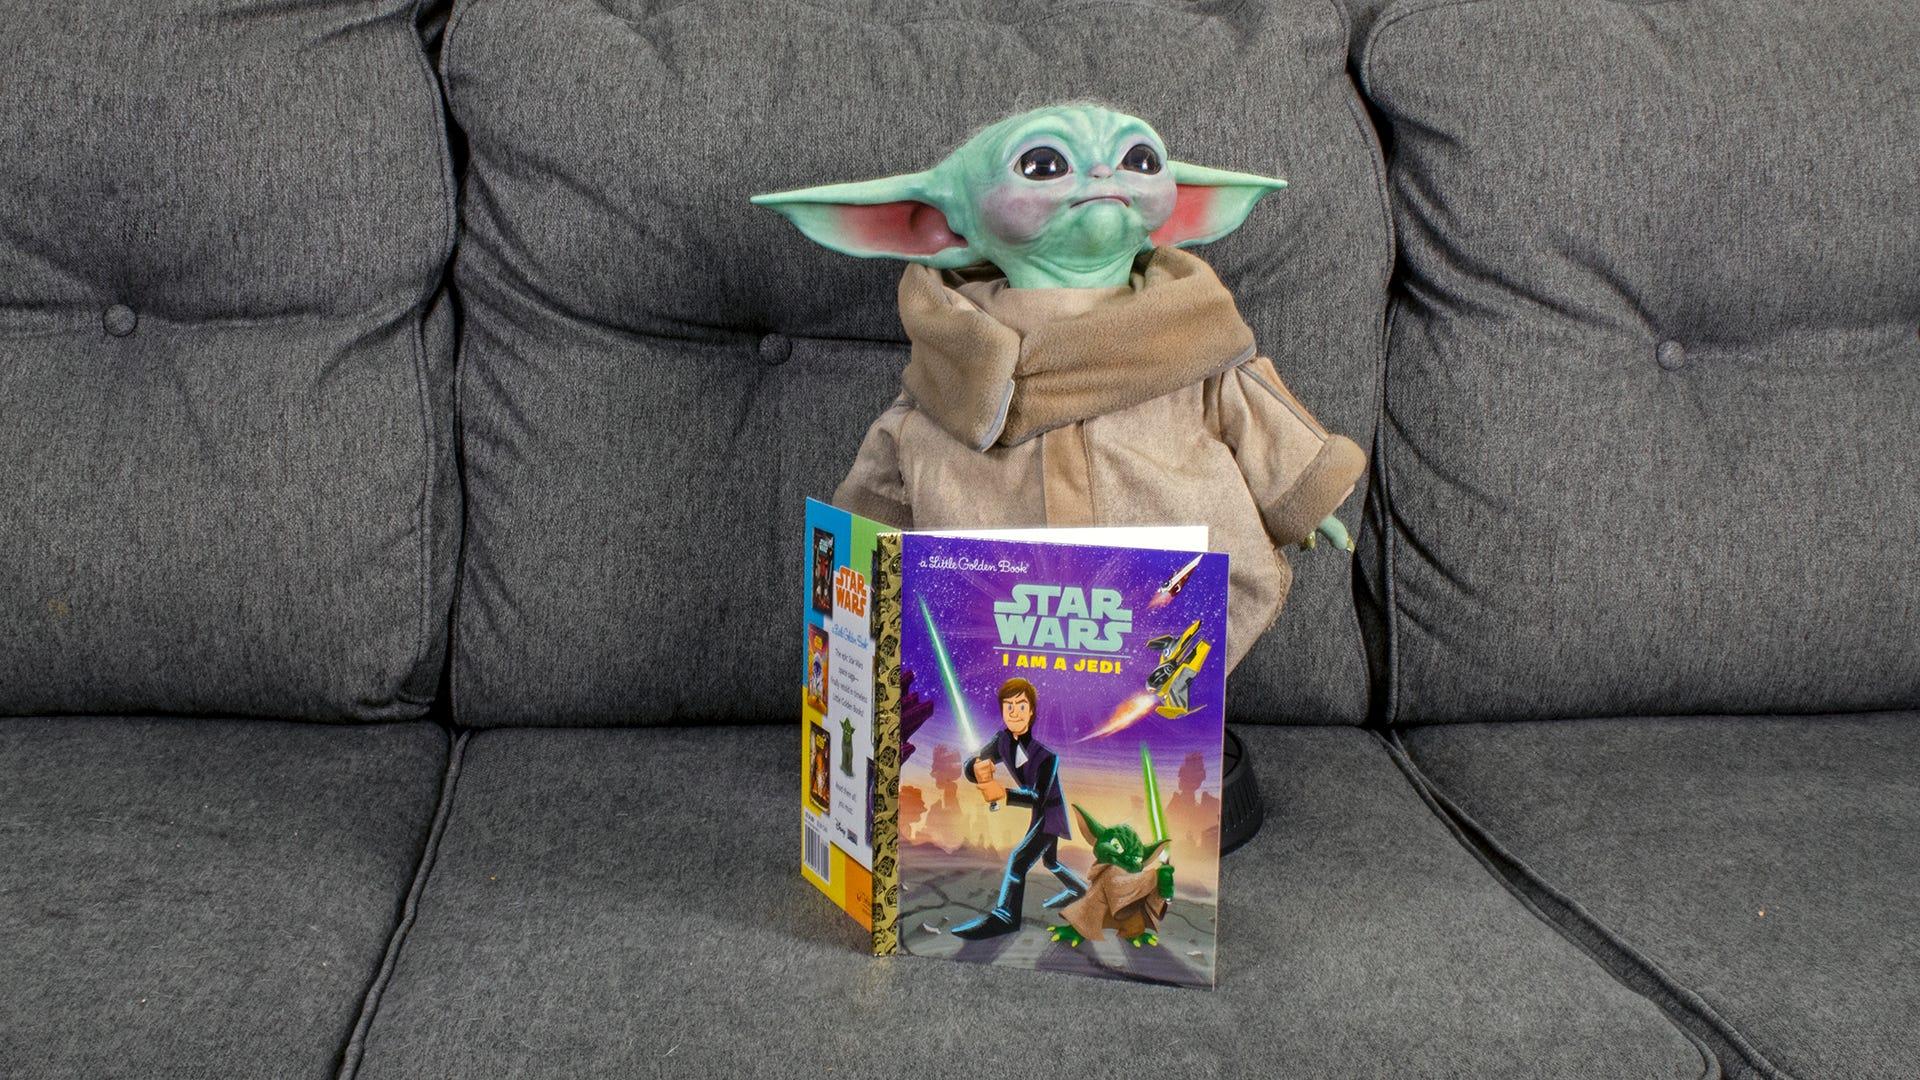 Baby Yoda next to a child's 'Star Wars' book.